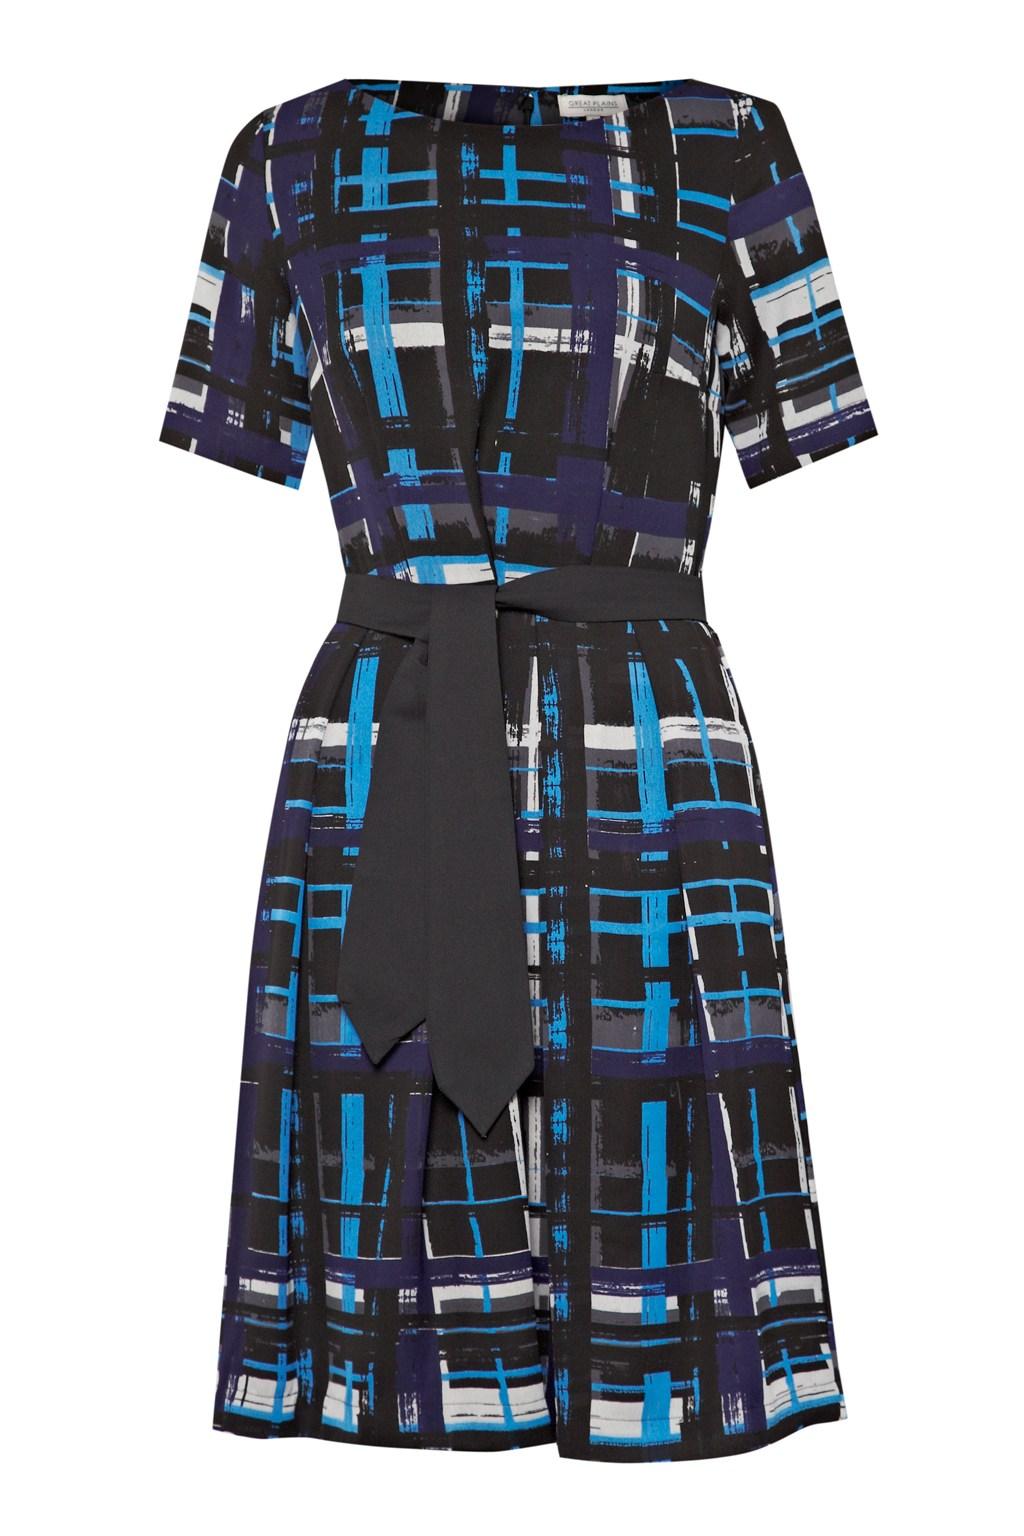 Great Plains, Check It Out Dress £65